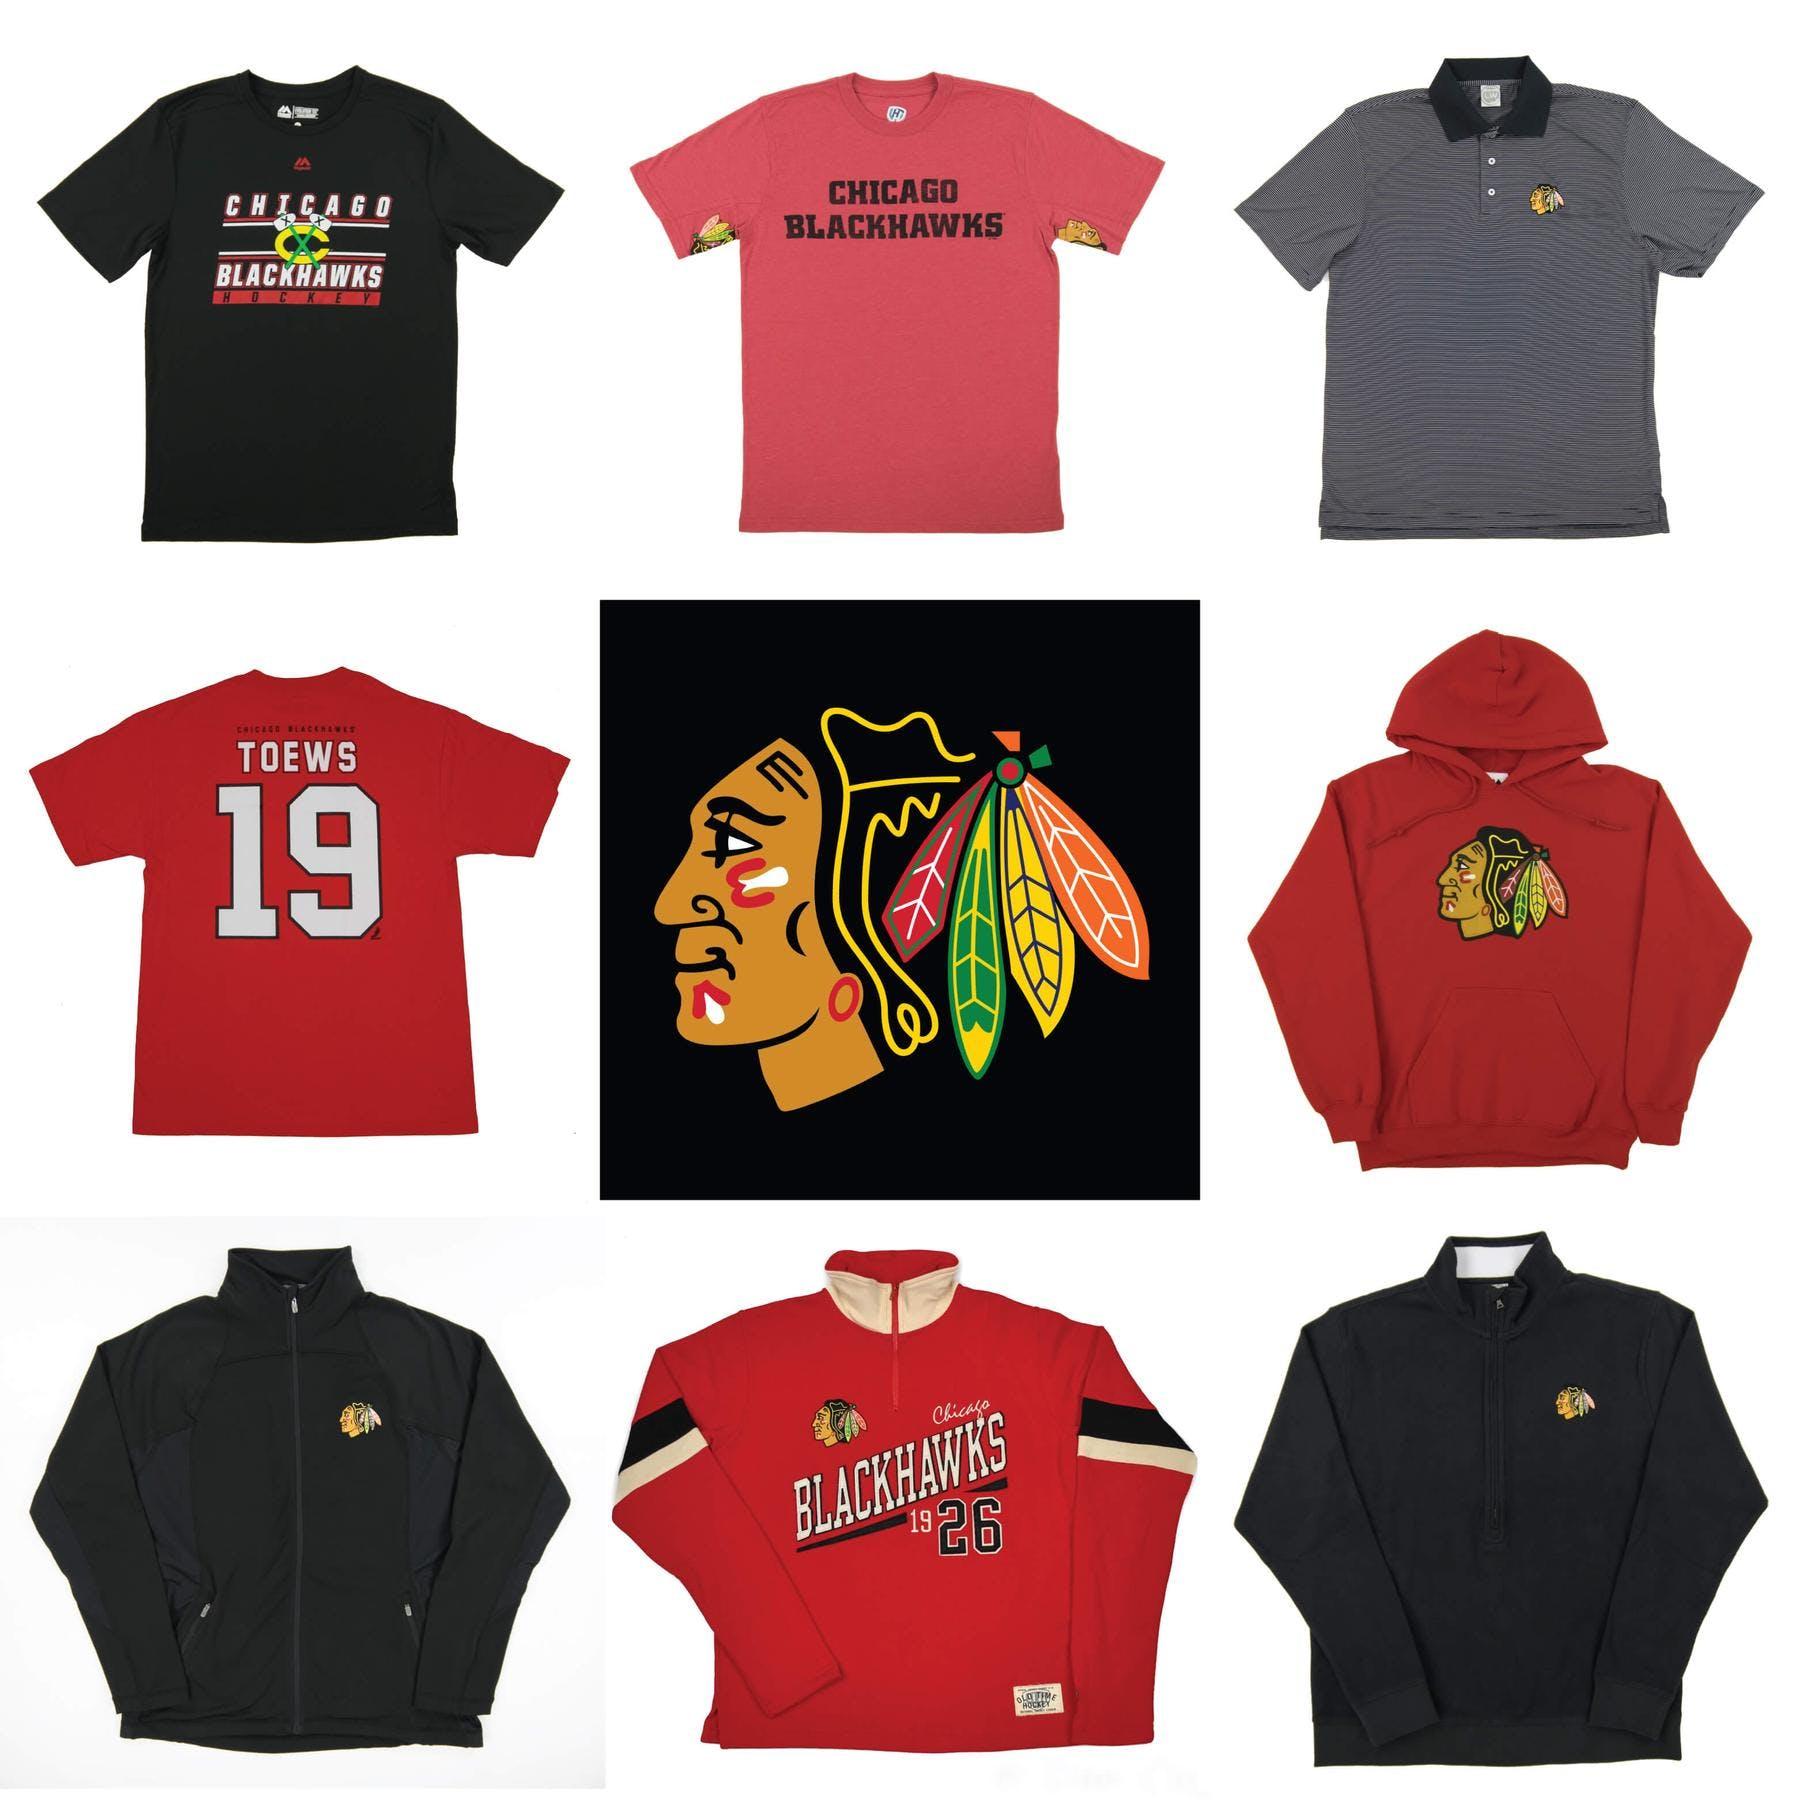 super popular f4189 abe10 Chicago Blackhawks Officially Licensed NHL Apparel Liquidation - 3,000+  Items, $132,000+ SRP!